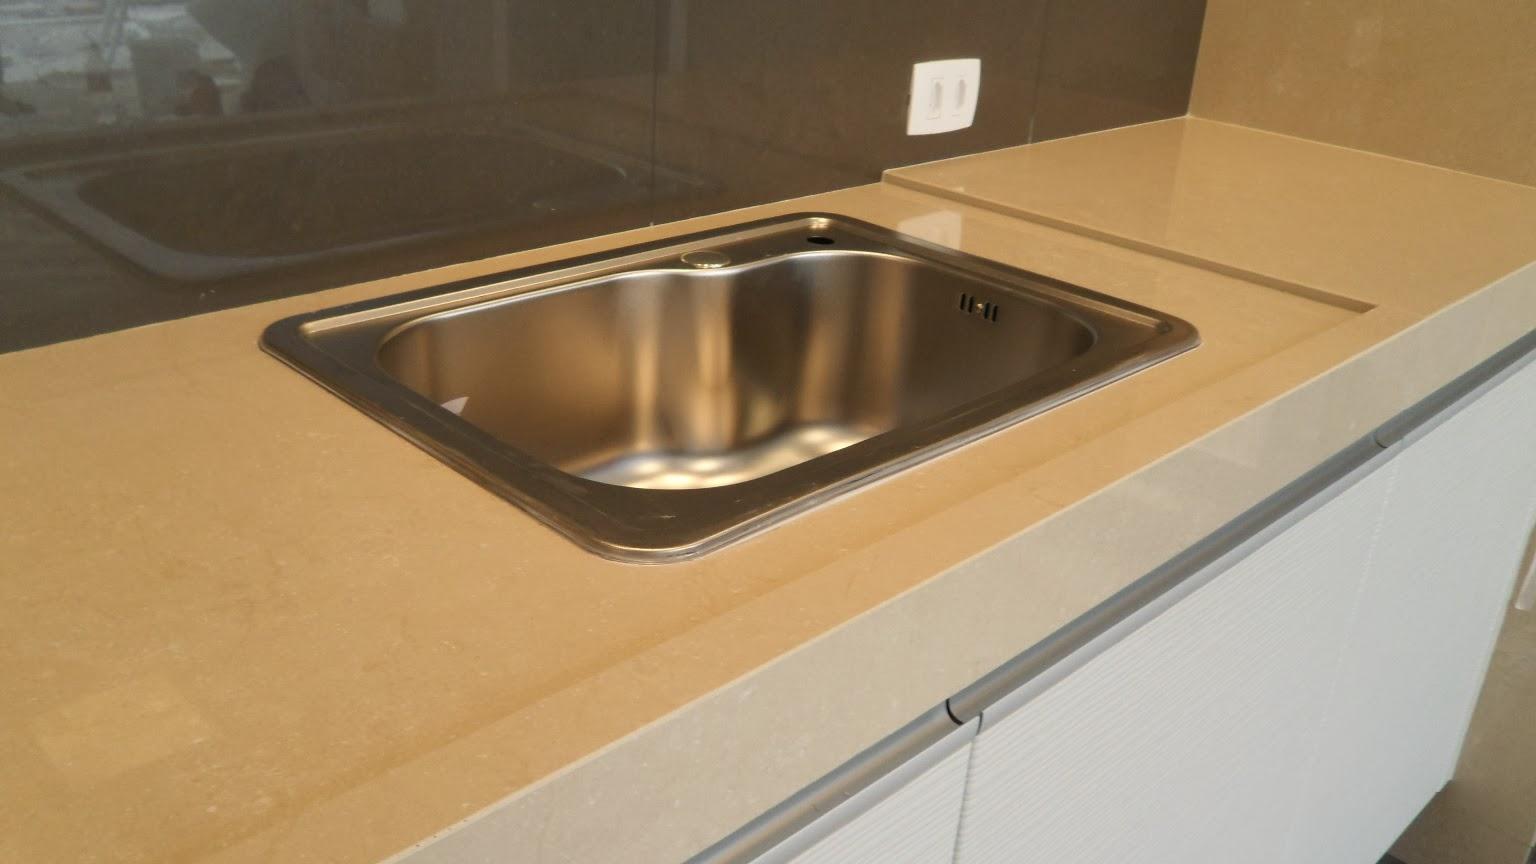 Modelo 6 Bancada de cozinha de porcelanato polido na cor bege  #916C3A 1536x864